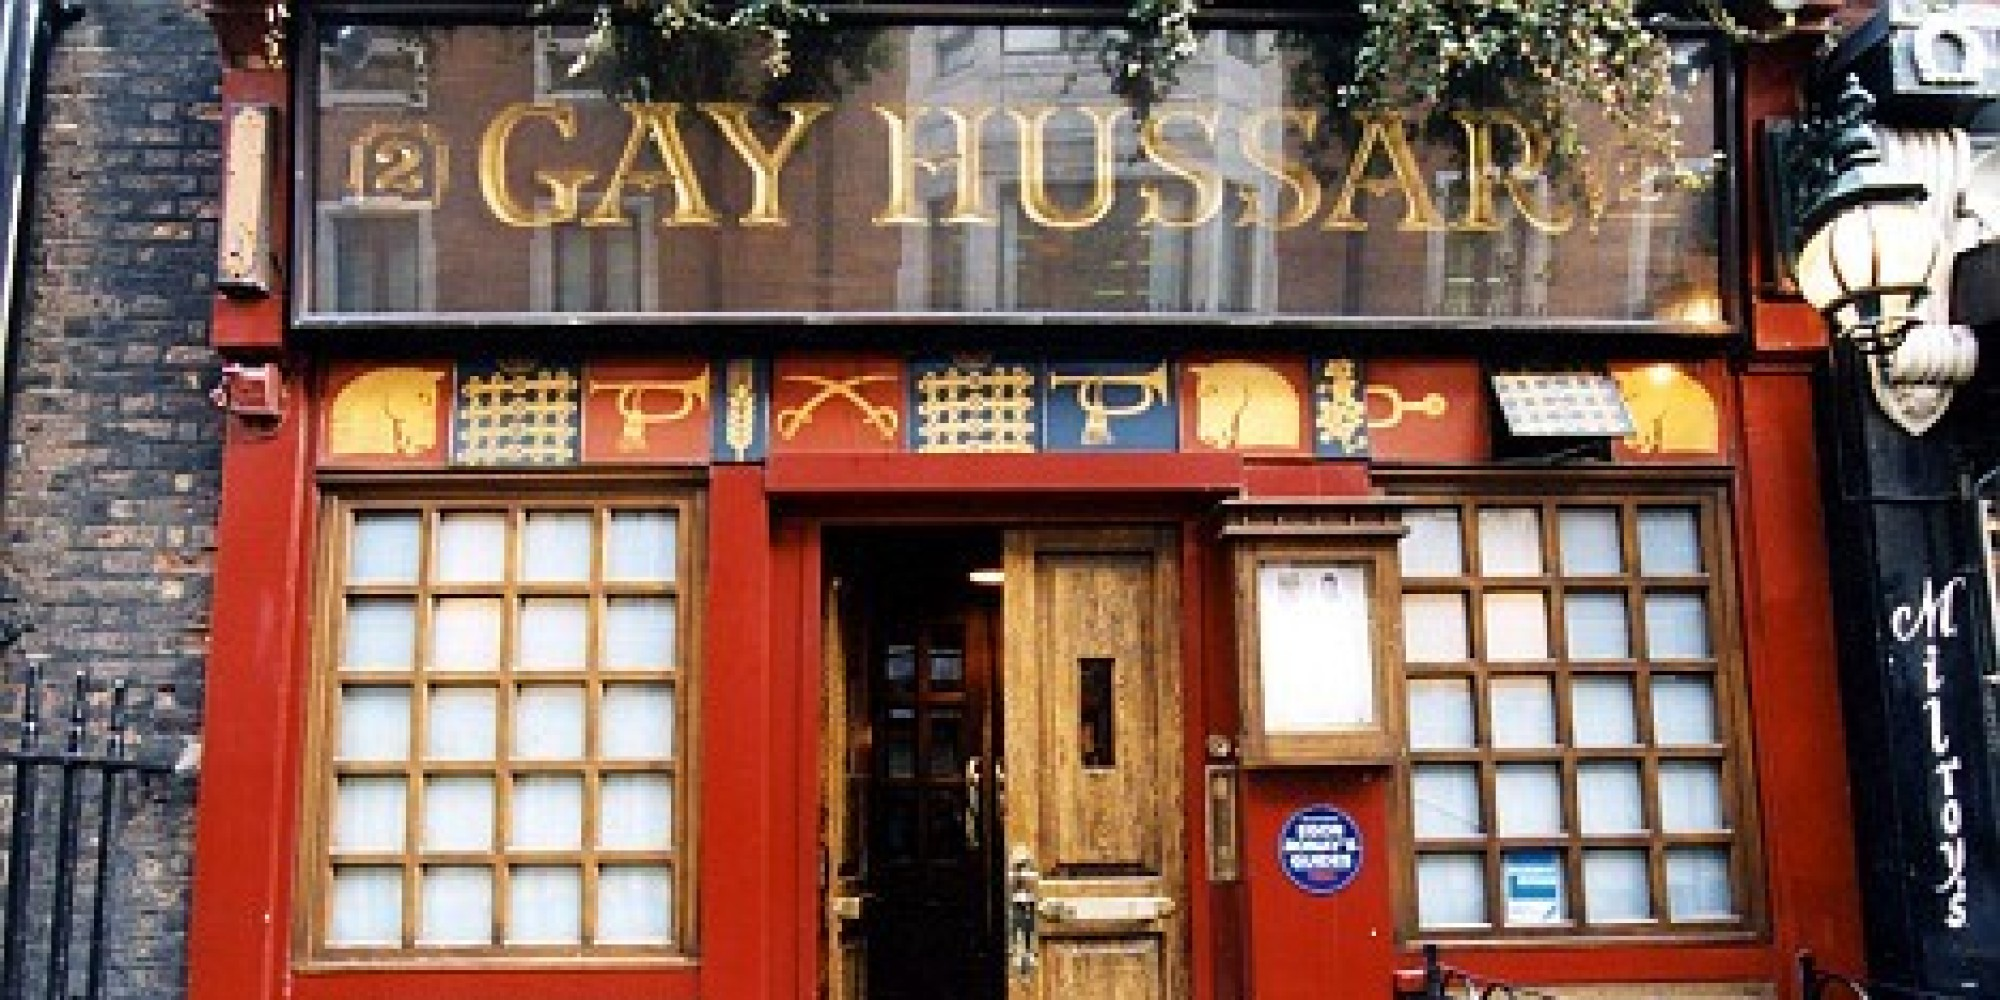 Cristopher recommends Gay pilot association